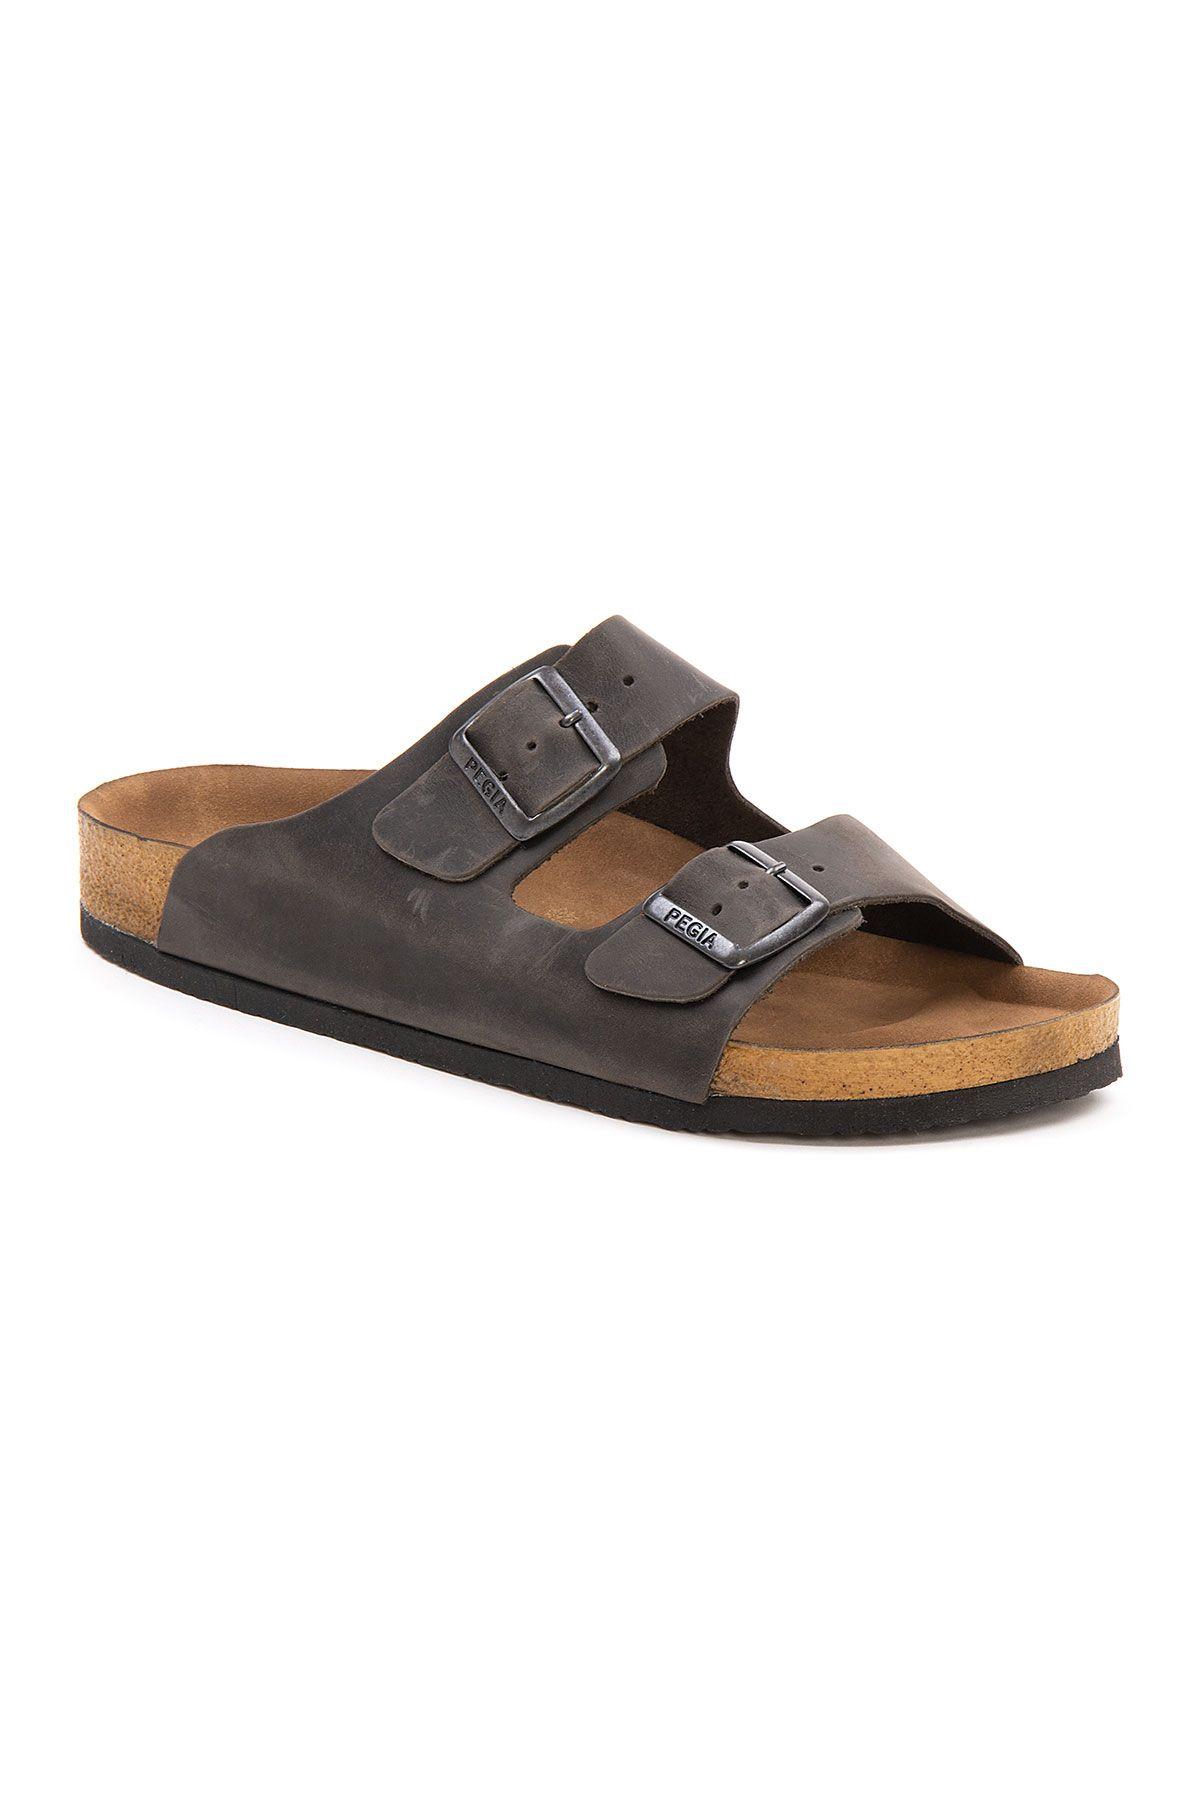 Pegia Men's Genuine Leather Slippers 215021 Anthracite-colored